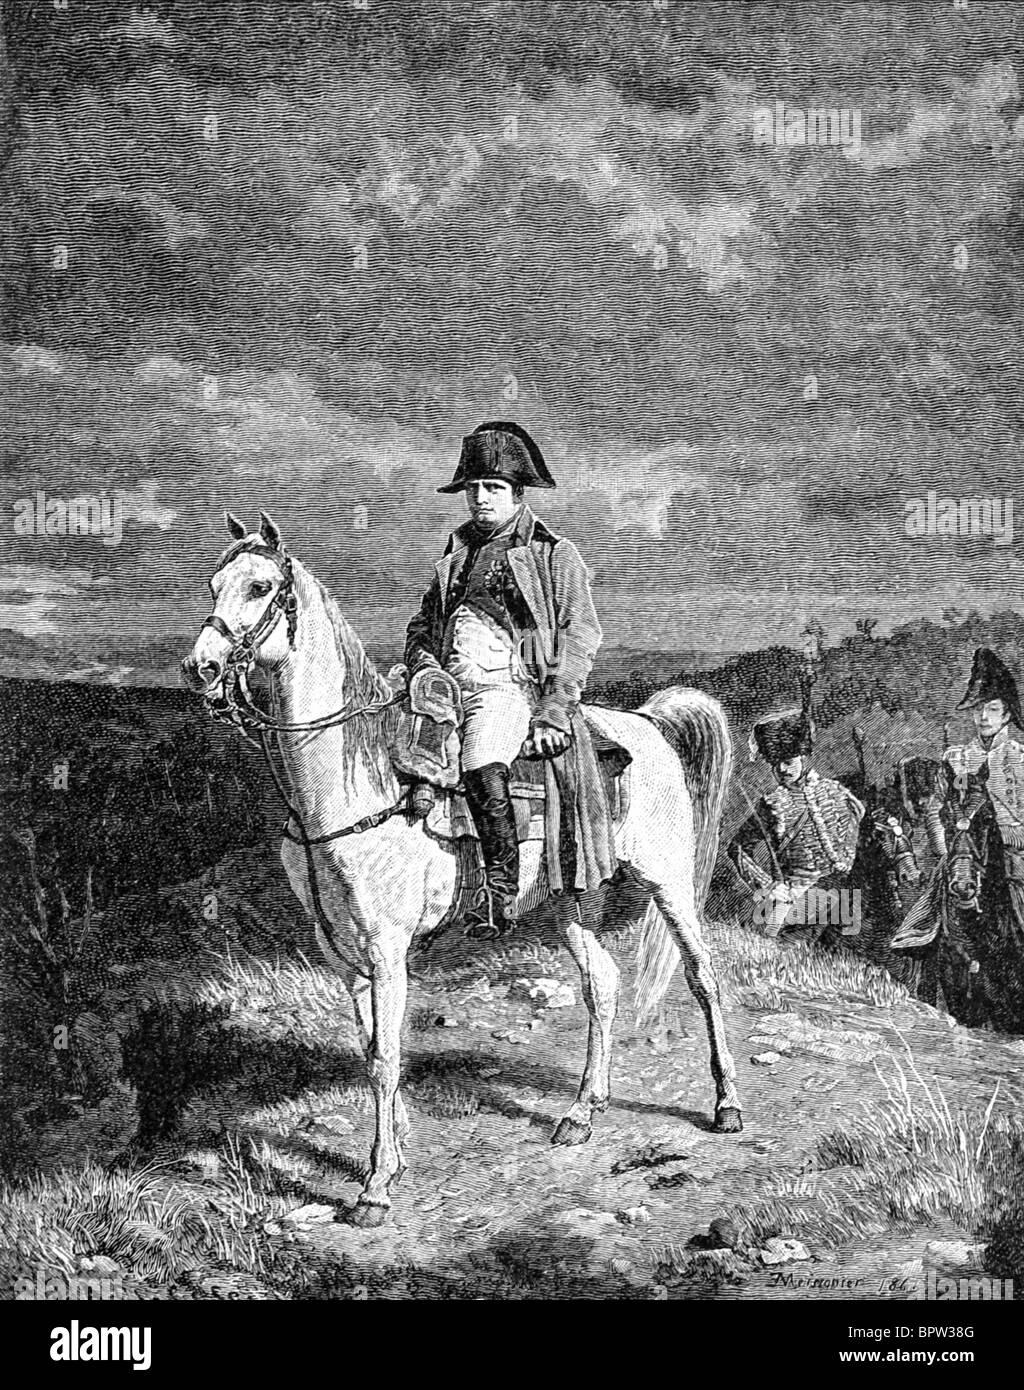 NAPOLEON BONAPARTE EMPEROR OF THE FRENCH 05 July 1809 VIENNA - Stock Image